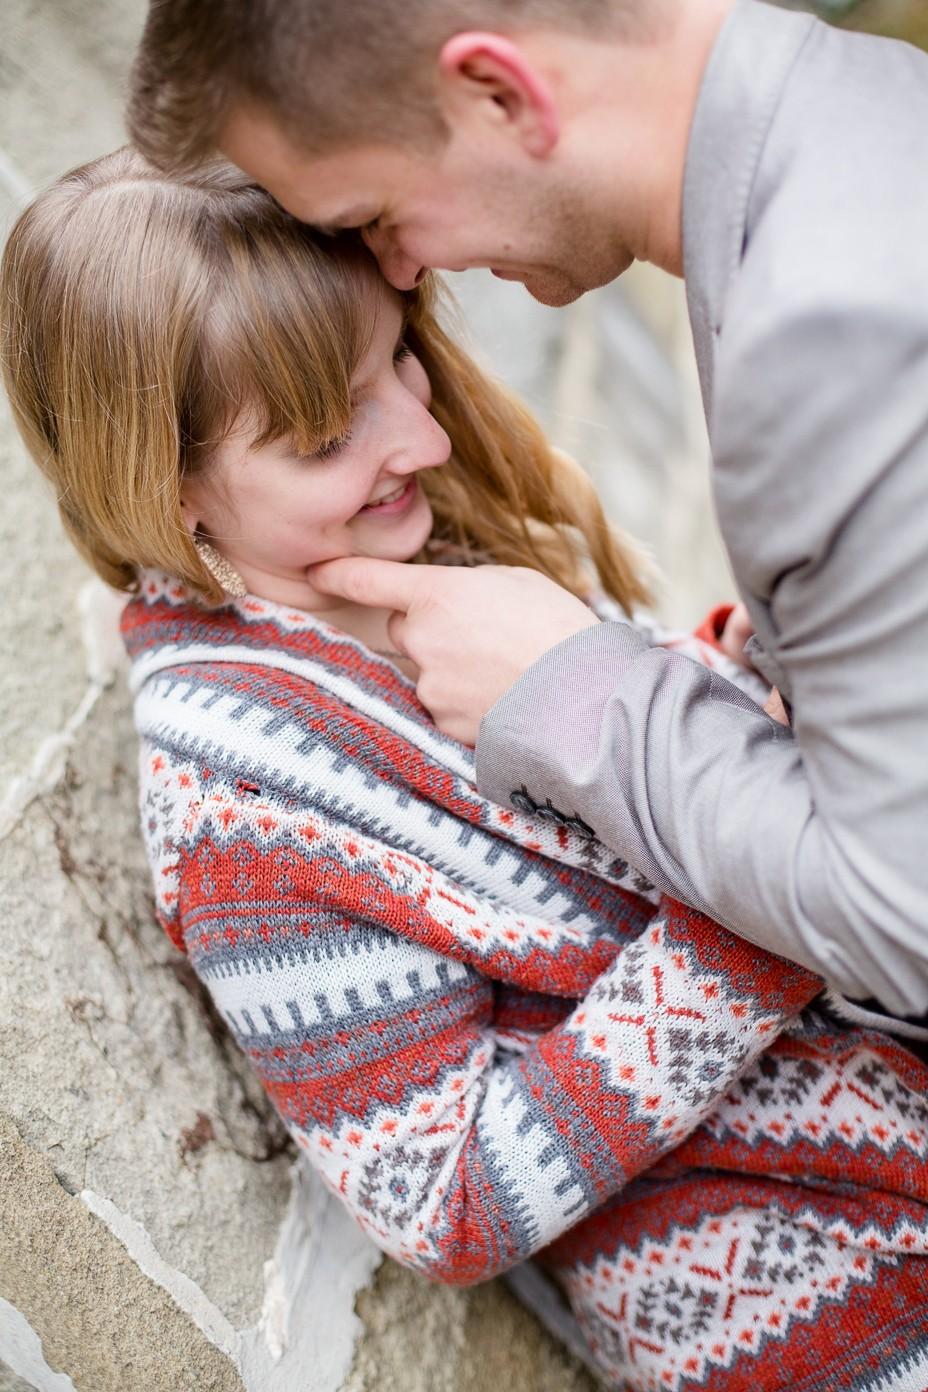 Engagementfotografie Kassel Inka Englisch Fotografie Verlobung Paerchenportraits